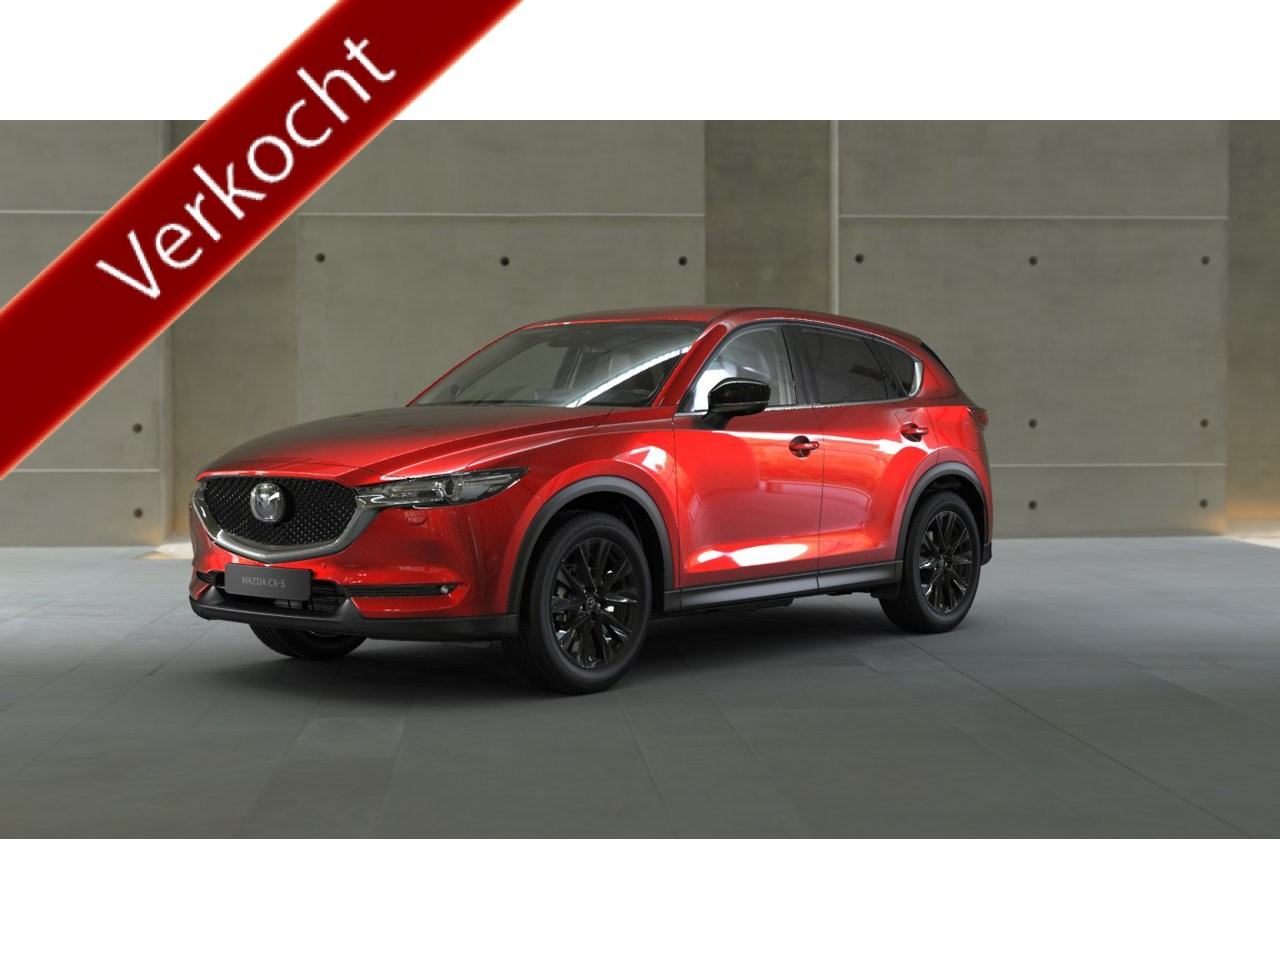 Mazda Cx-5 2.0 skyactiv-g 165 sportive at € 5.437, - voorraad + bpm voordeel